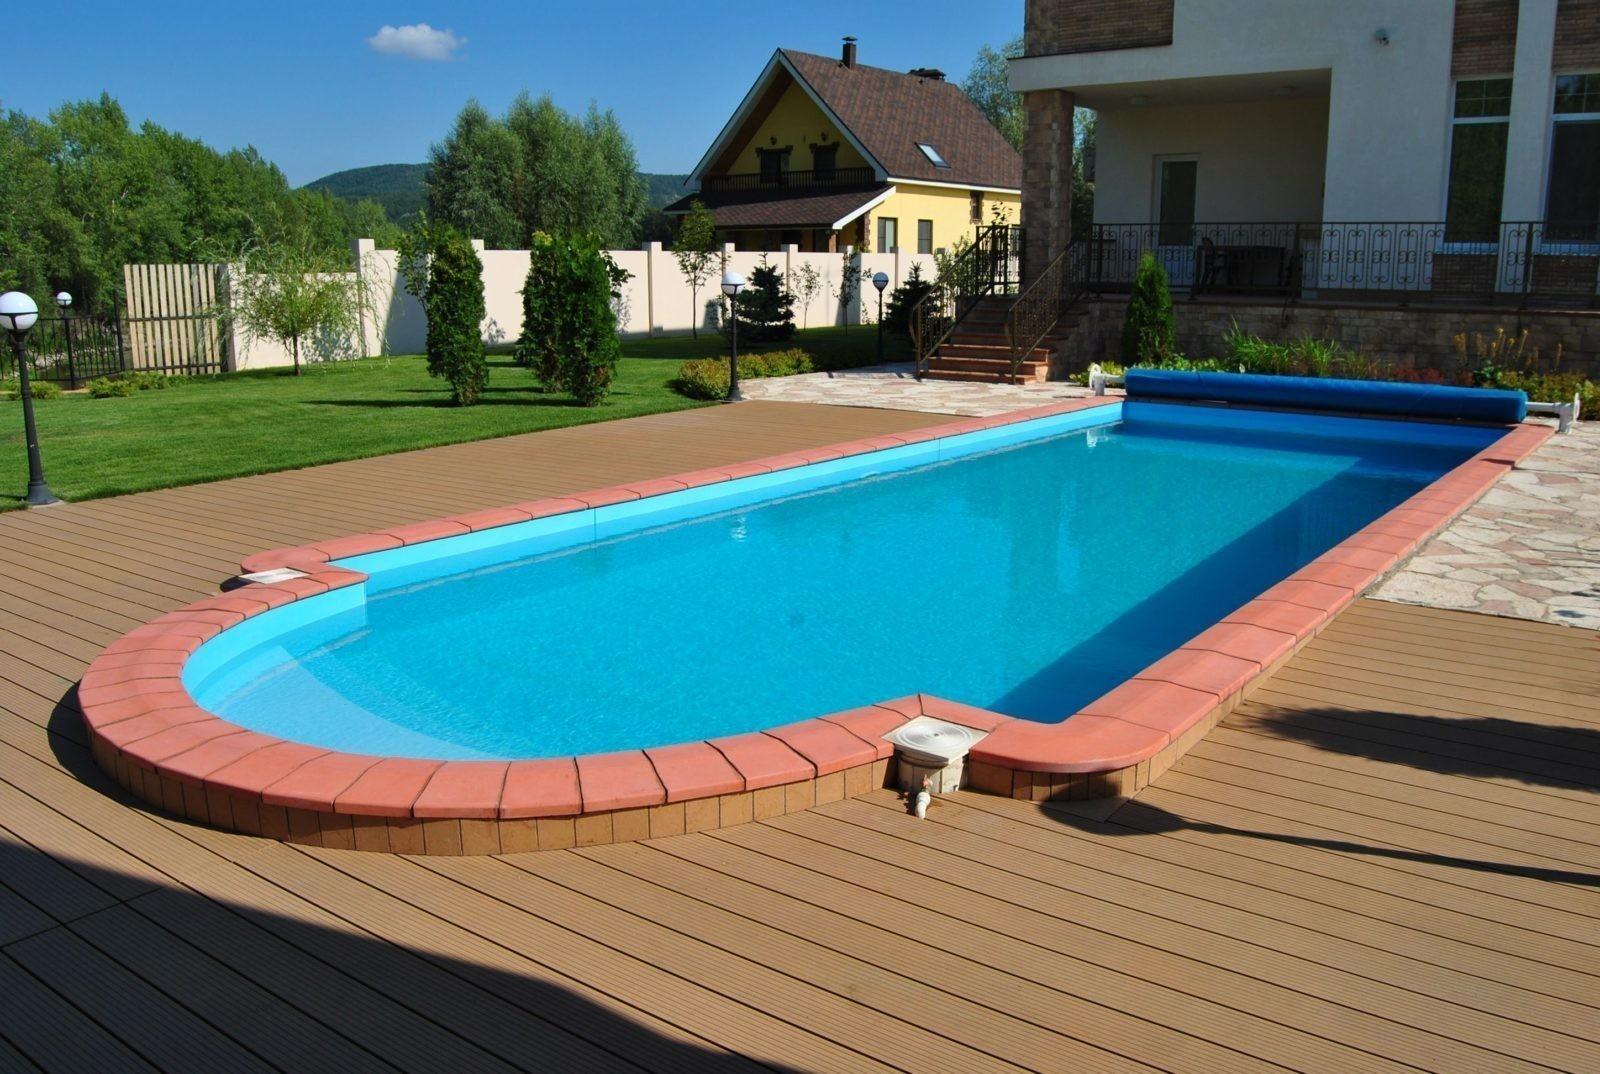 [:ua]Кошторис на будівництво басейну[:ru]Смета на строительство бассейна[:]